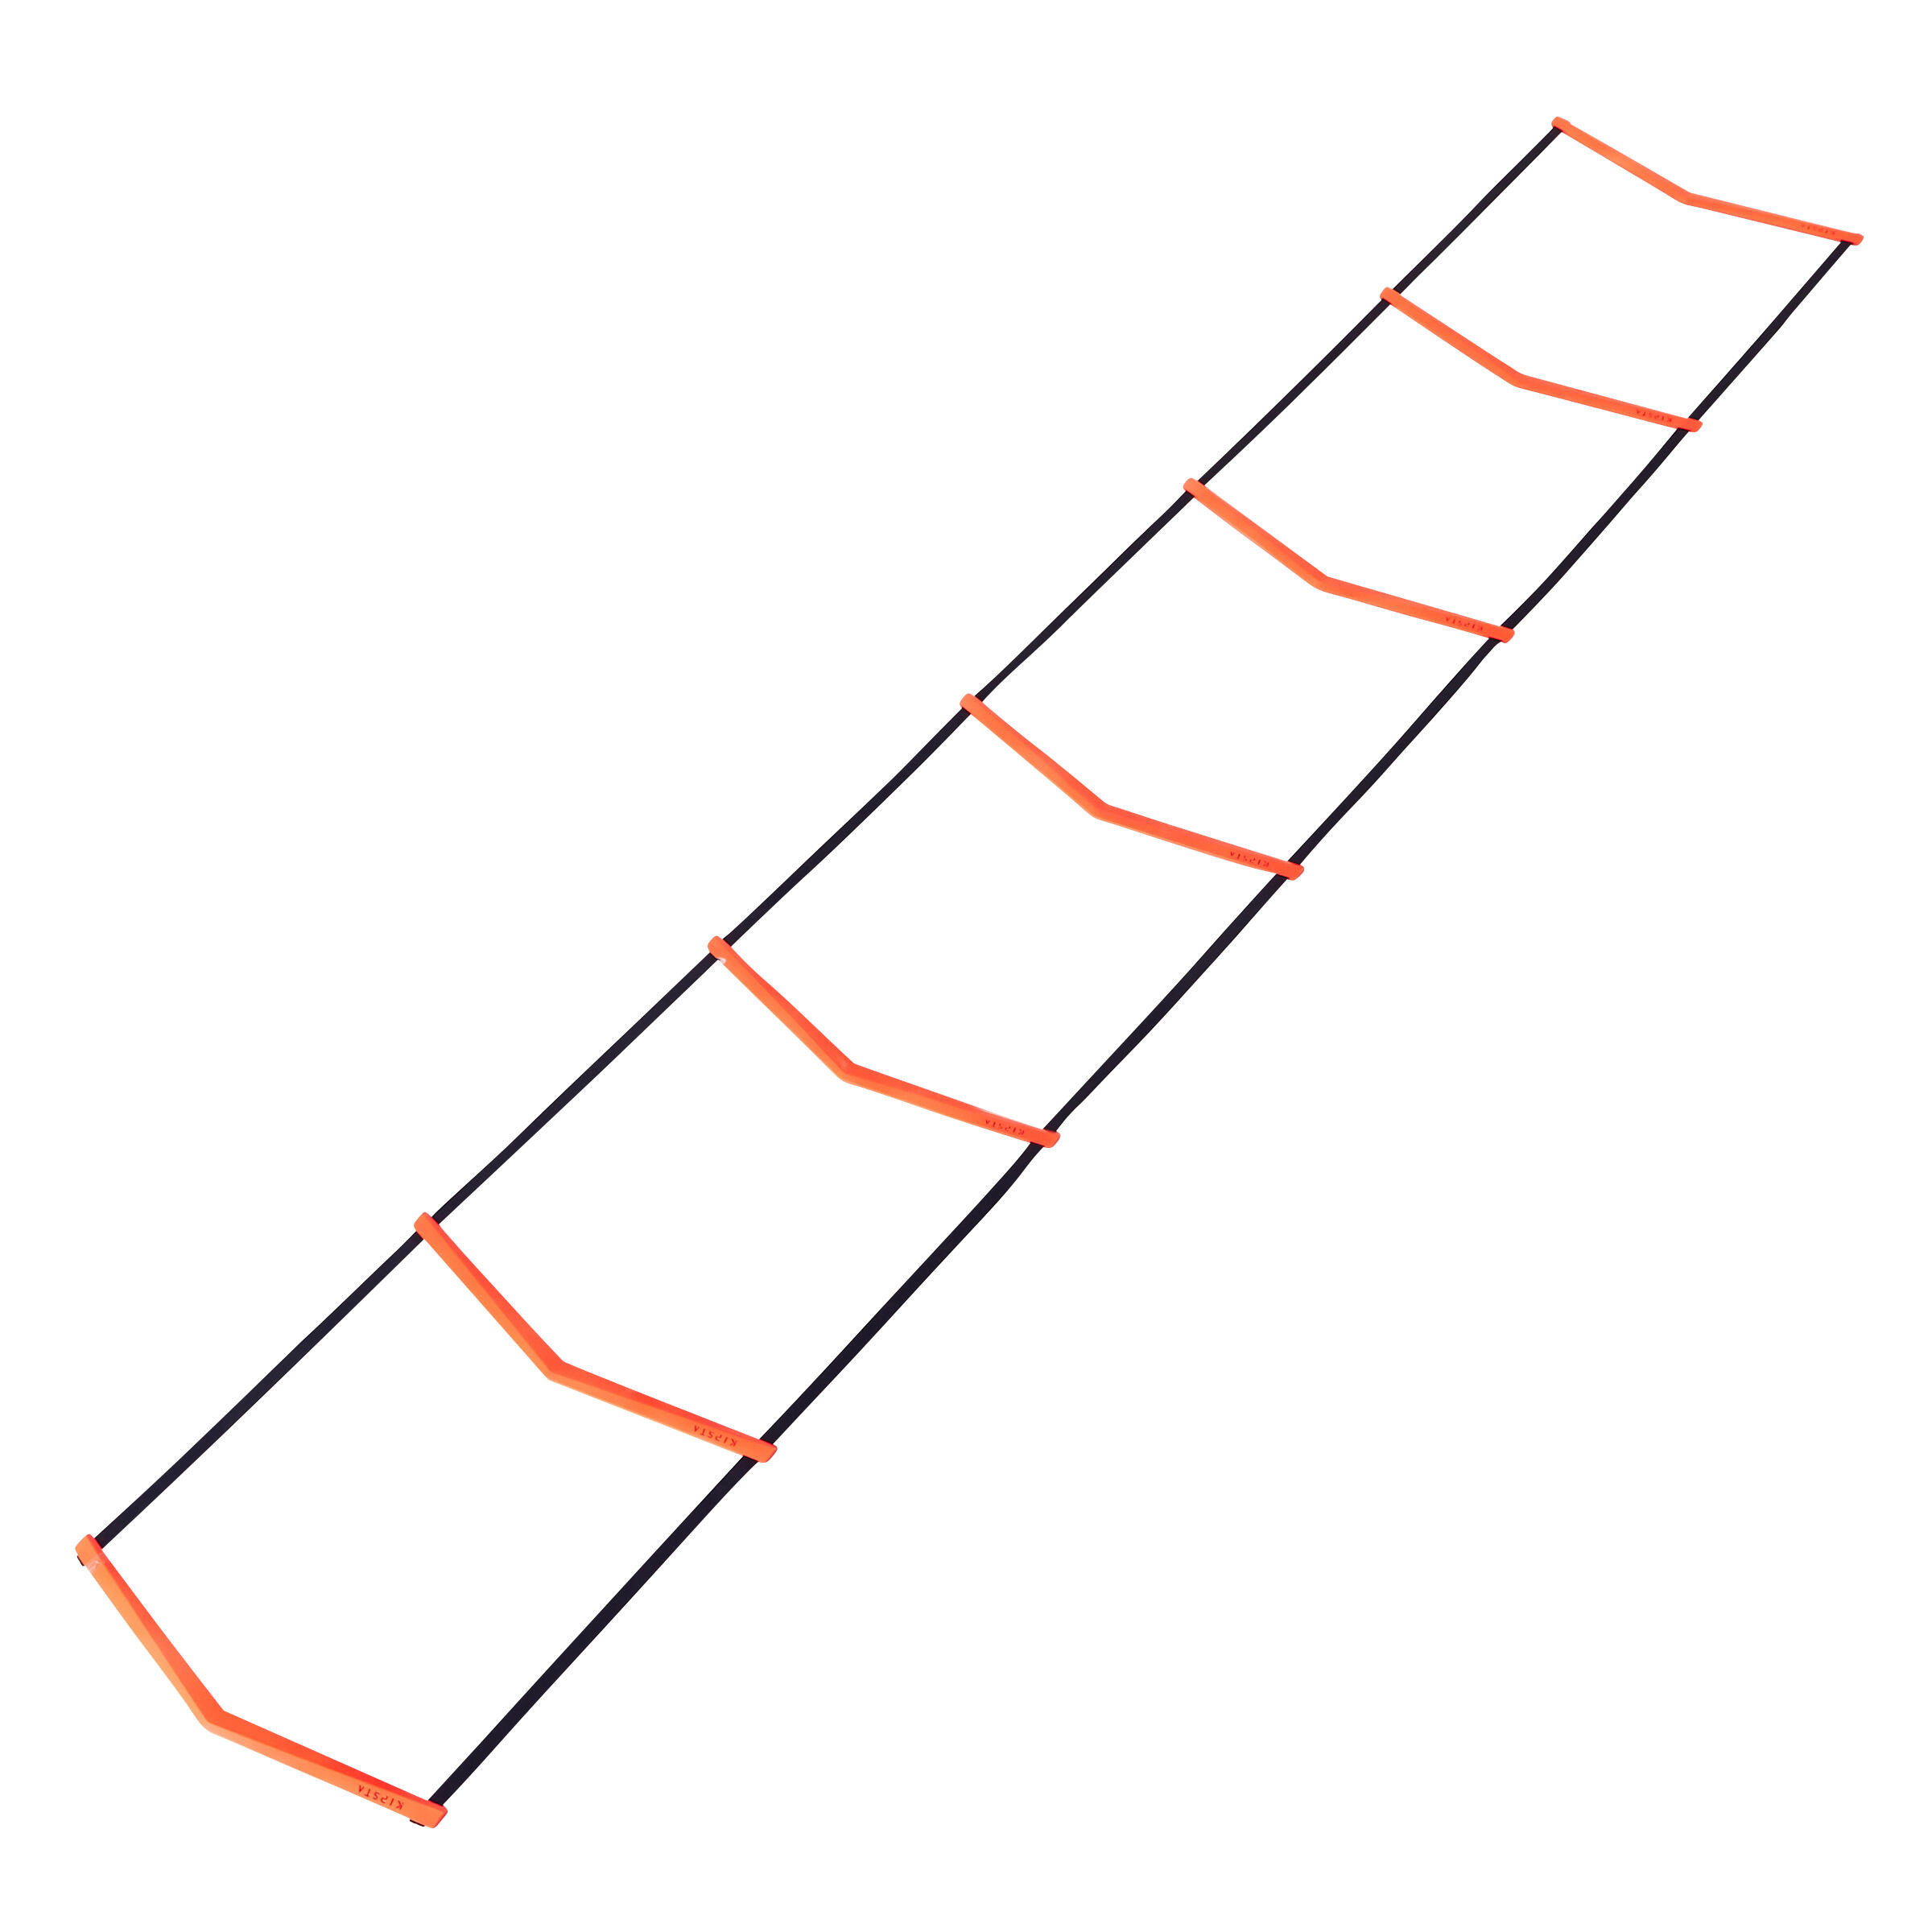 Kipsta Speed ladder Essential 3,20 meter oranje kopen? Sport>Trainingsmateriaal>Speedladders met voordeel vind je hier